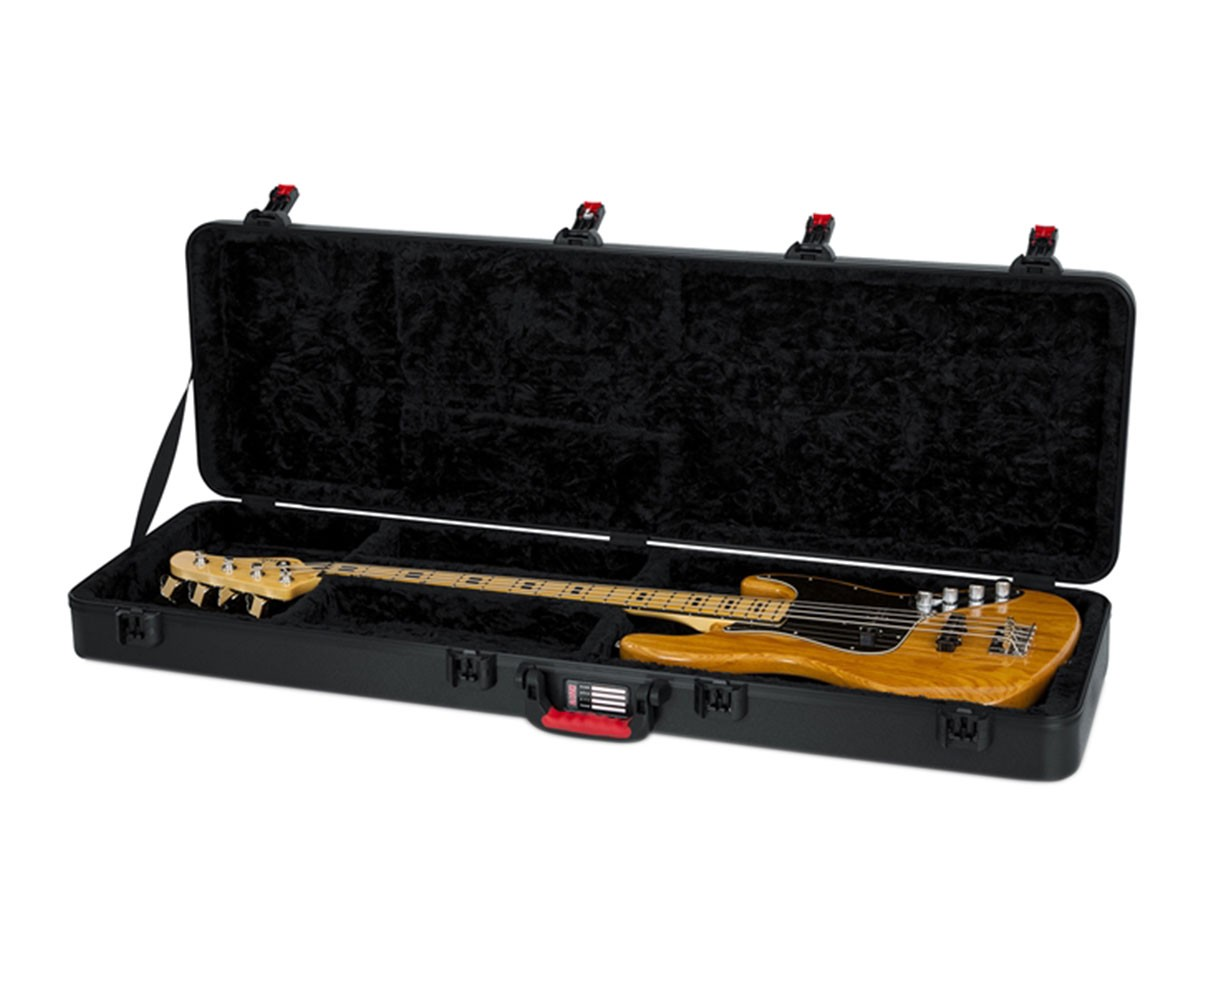 Gator TSA Series ATA Molded Polyethylene Guitar Case for Bass Guitars